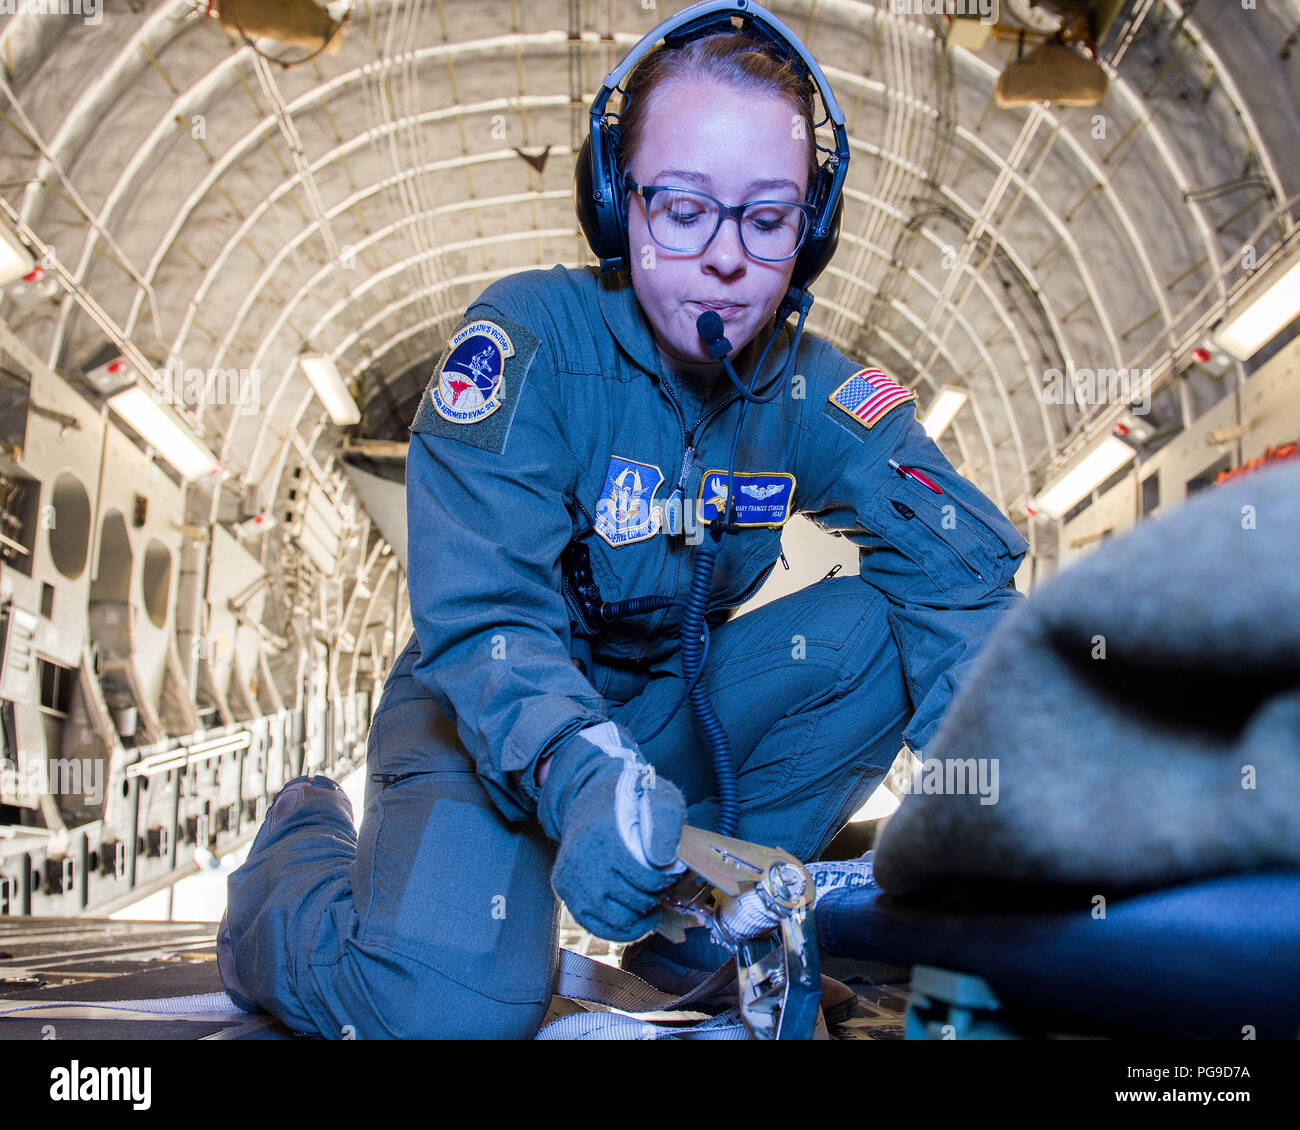 U S  Air Force Senior Airman Mary Stinson, 934th Aeromedical